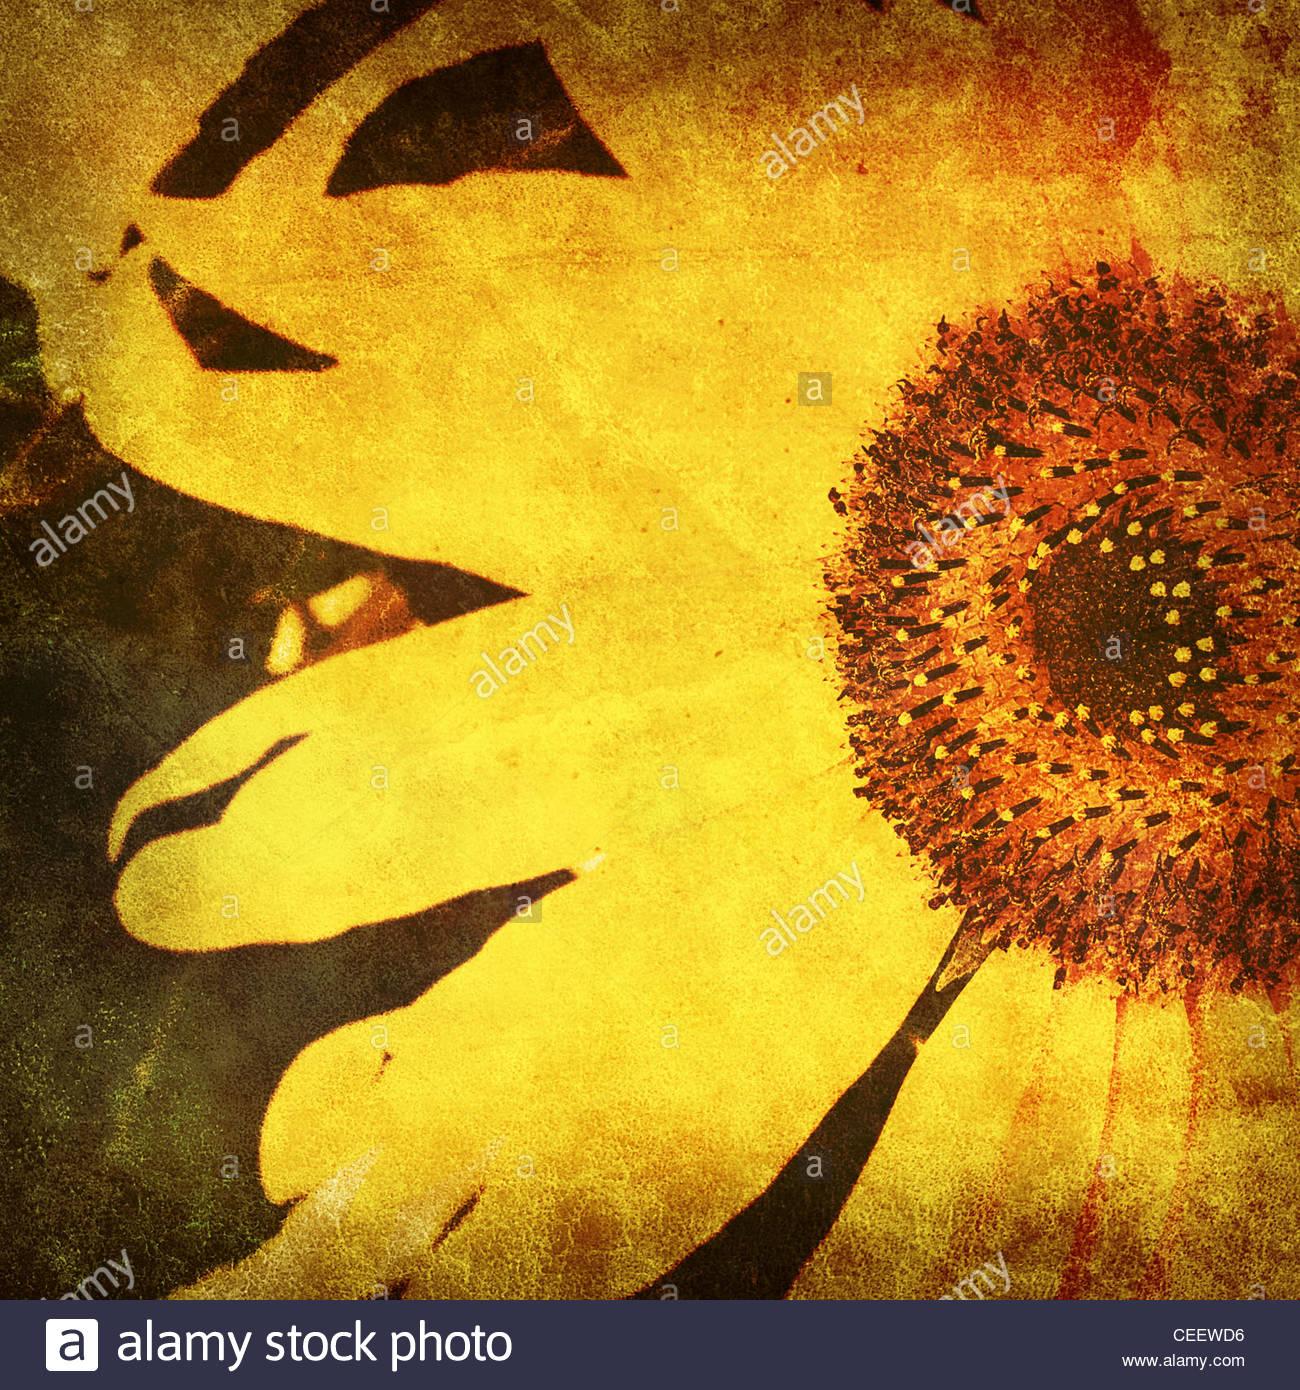 vintage sunflower photo - Stock Image